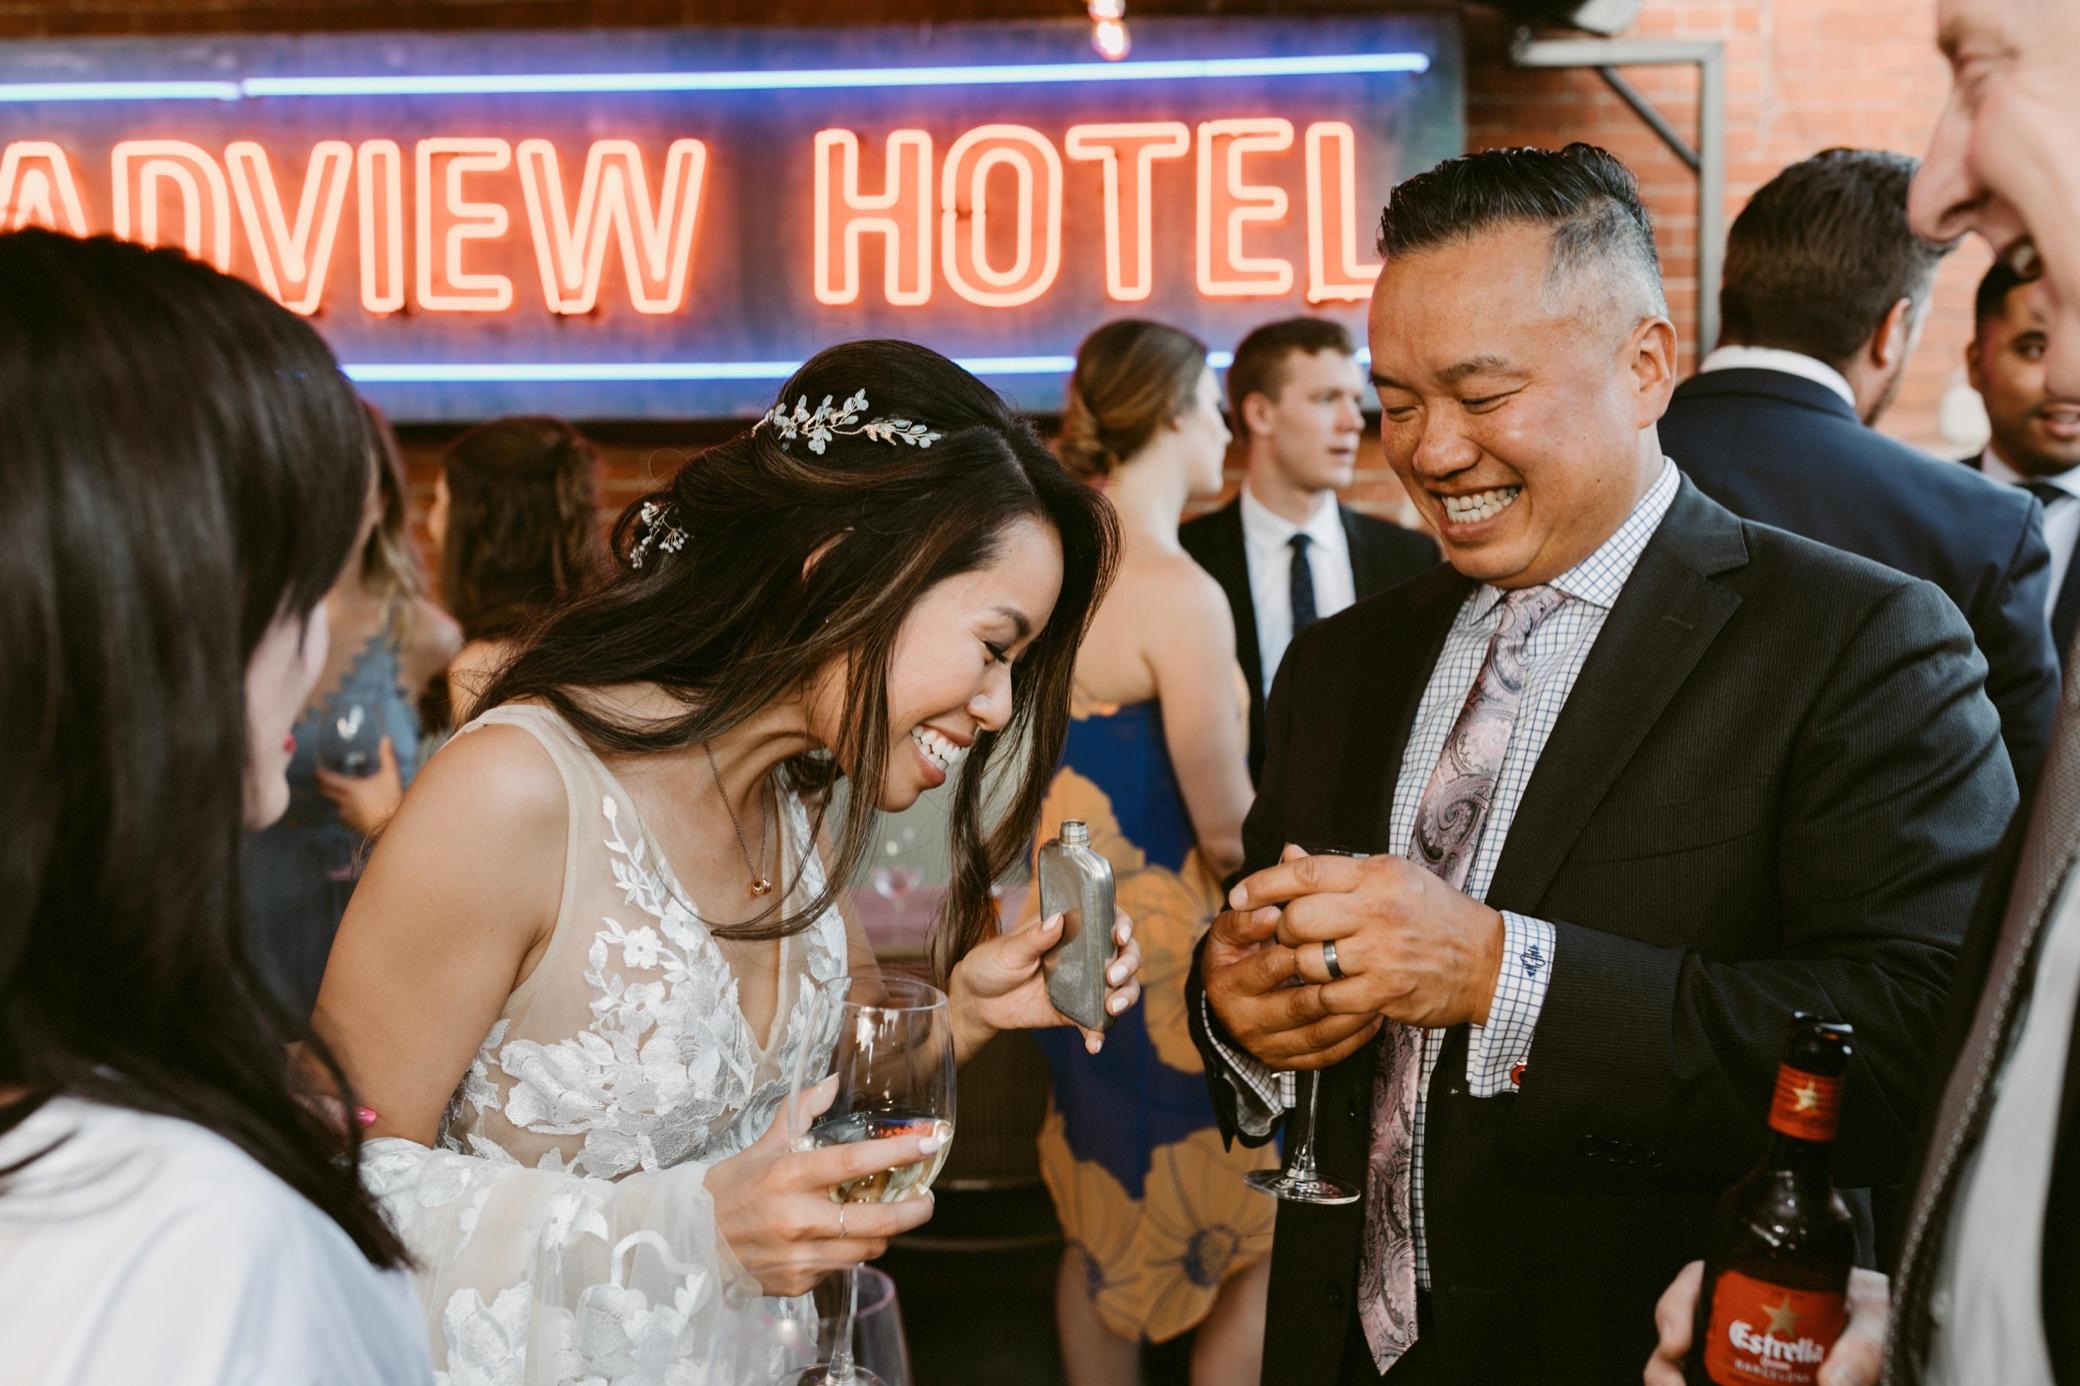 078_The Broadview Hotel Wedding (557 of 913).jpg